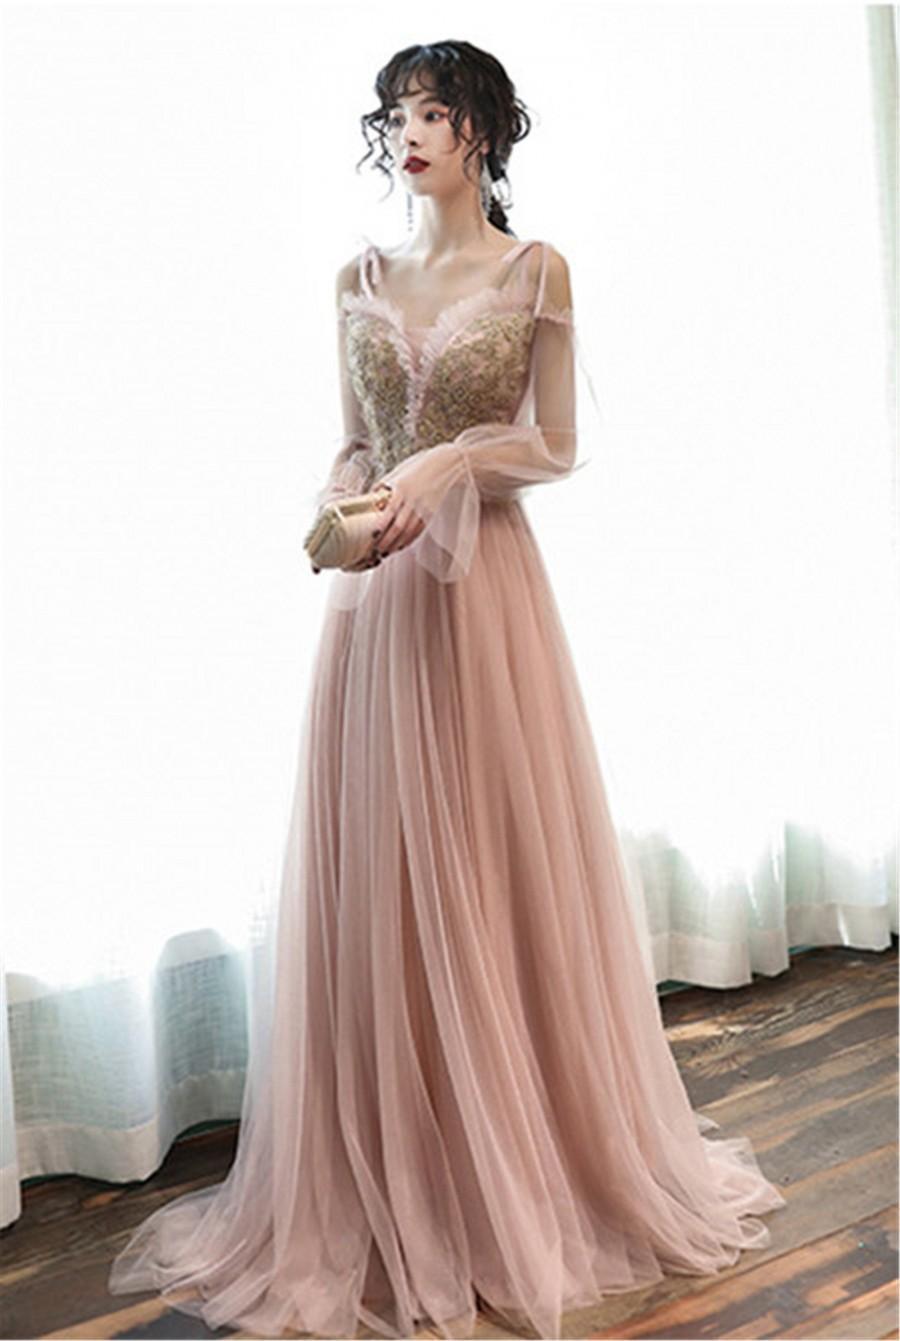 Mariage - Bishop Wedding Dress Dusty Pink V-Neck Bridal Dress Lace Up Back Bridesmaid Dress Spaghetti Strap Prom Dress Lace Appliques Event Dress Long